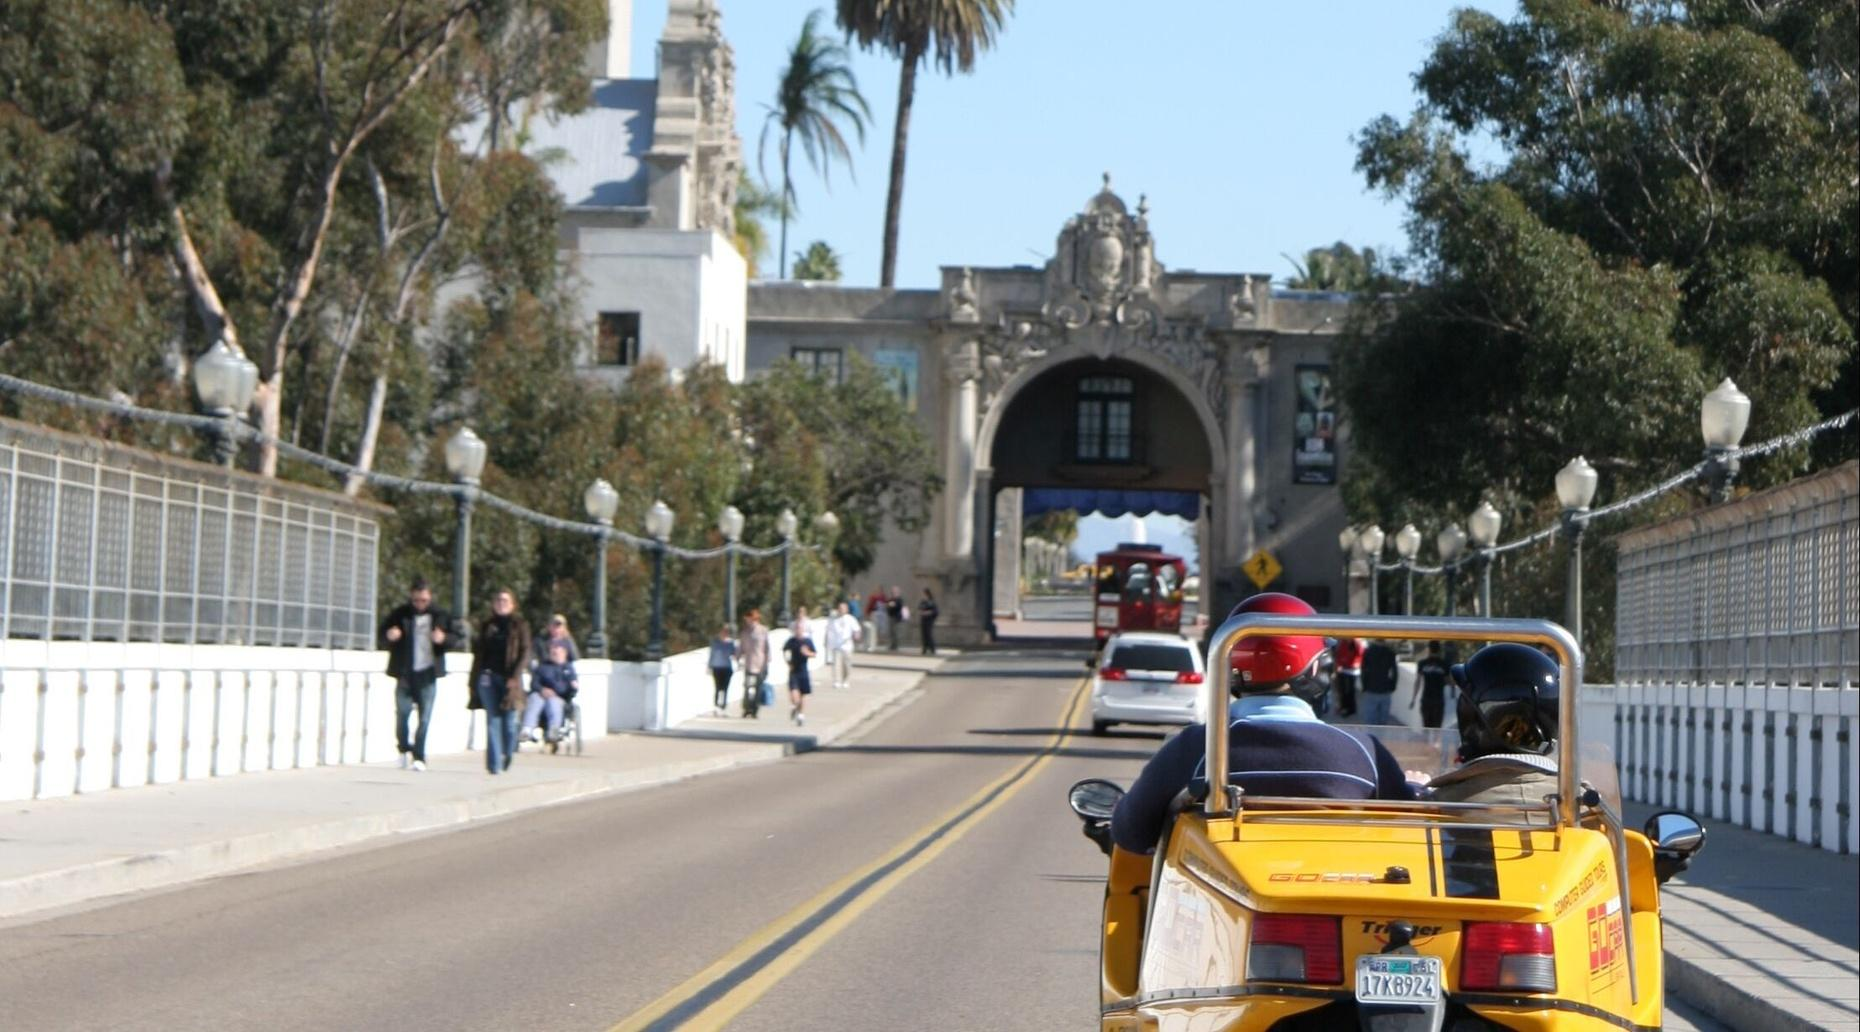 2-Hour Downtown and Balboa GoCar Tour